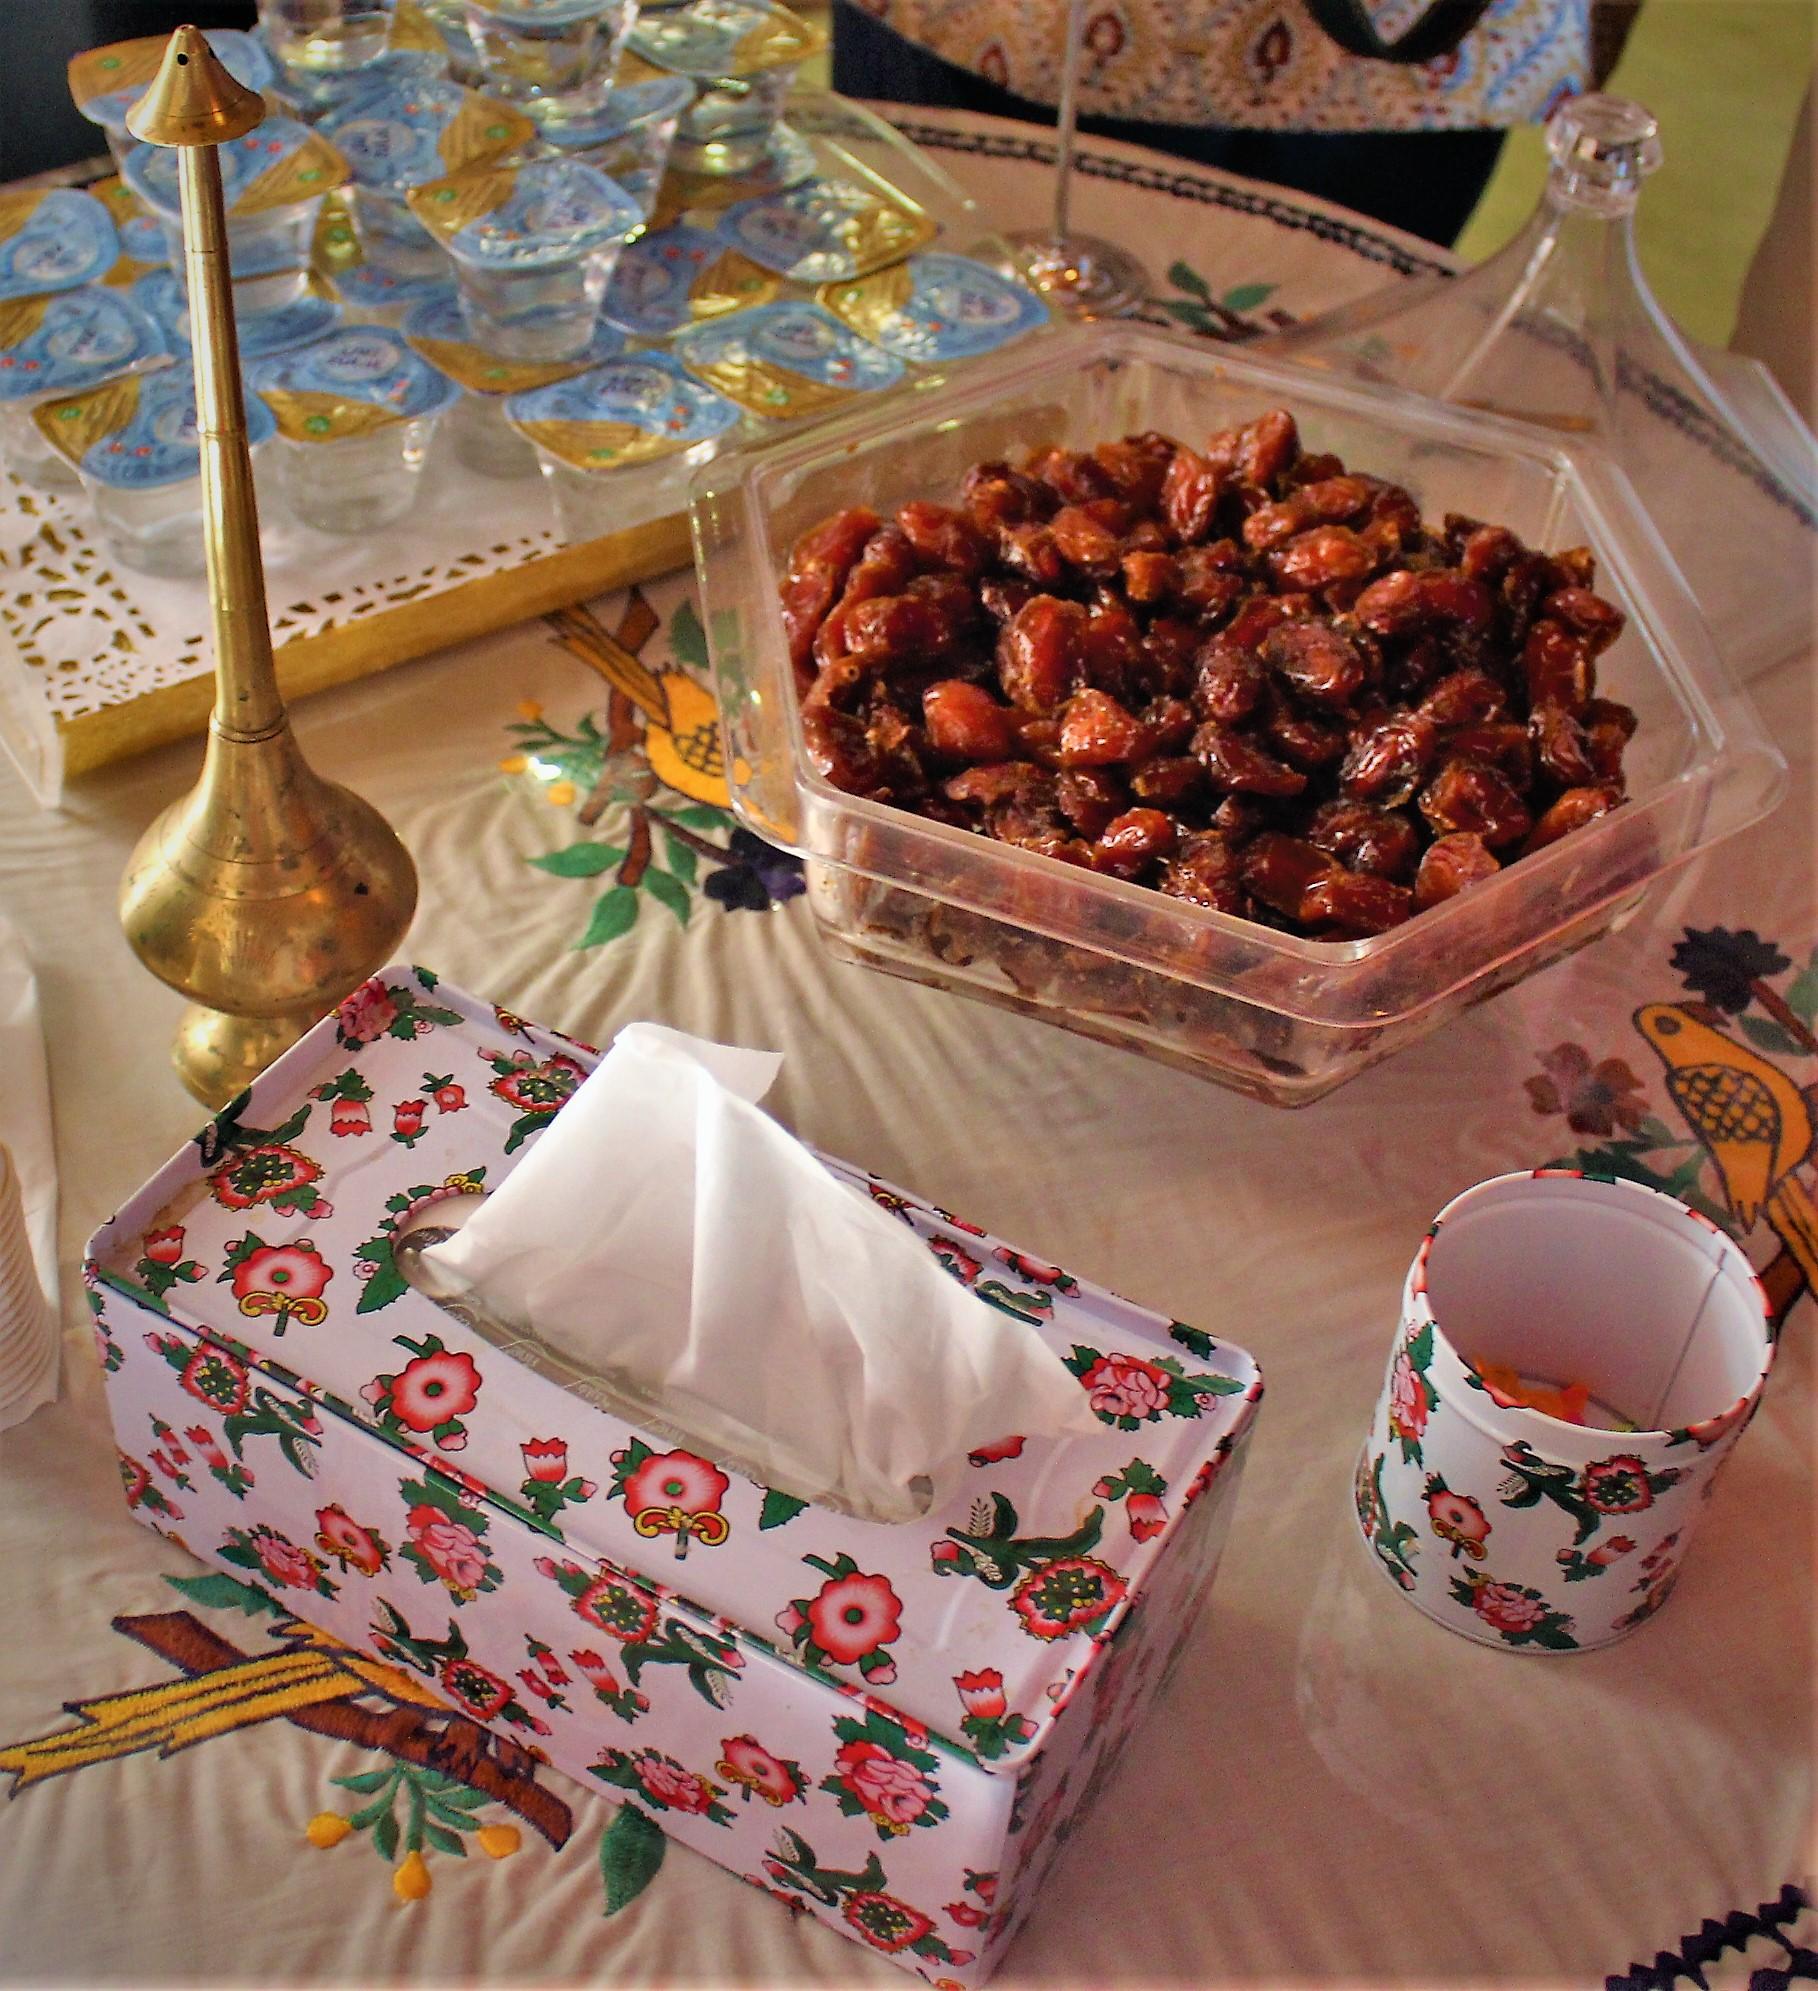 Unsweetened Turkish tea with dates